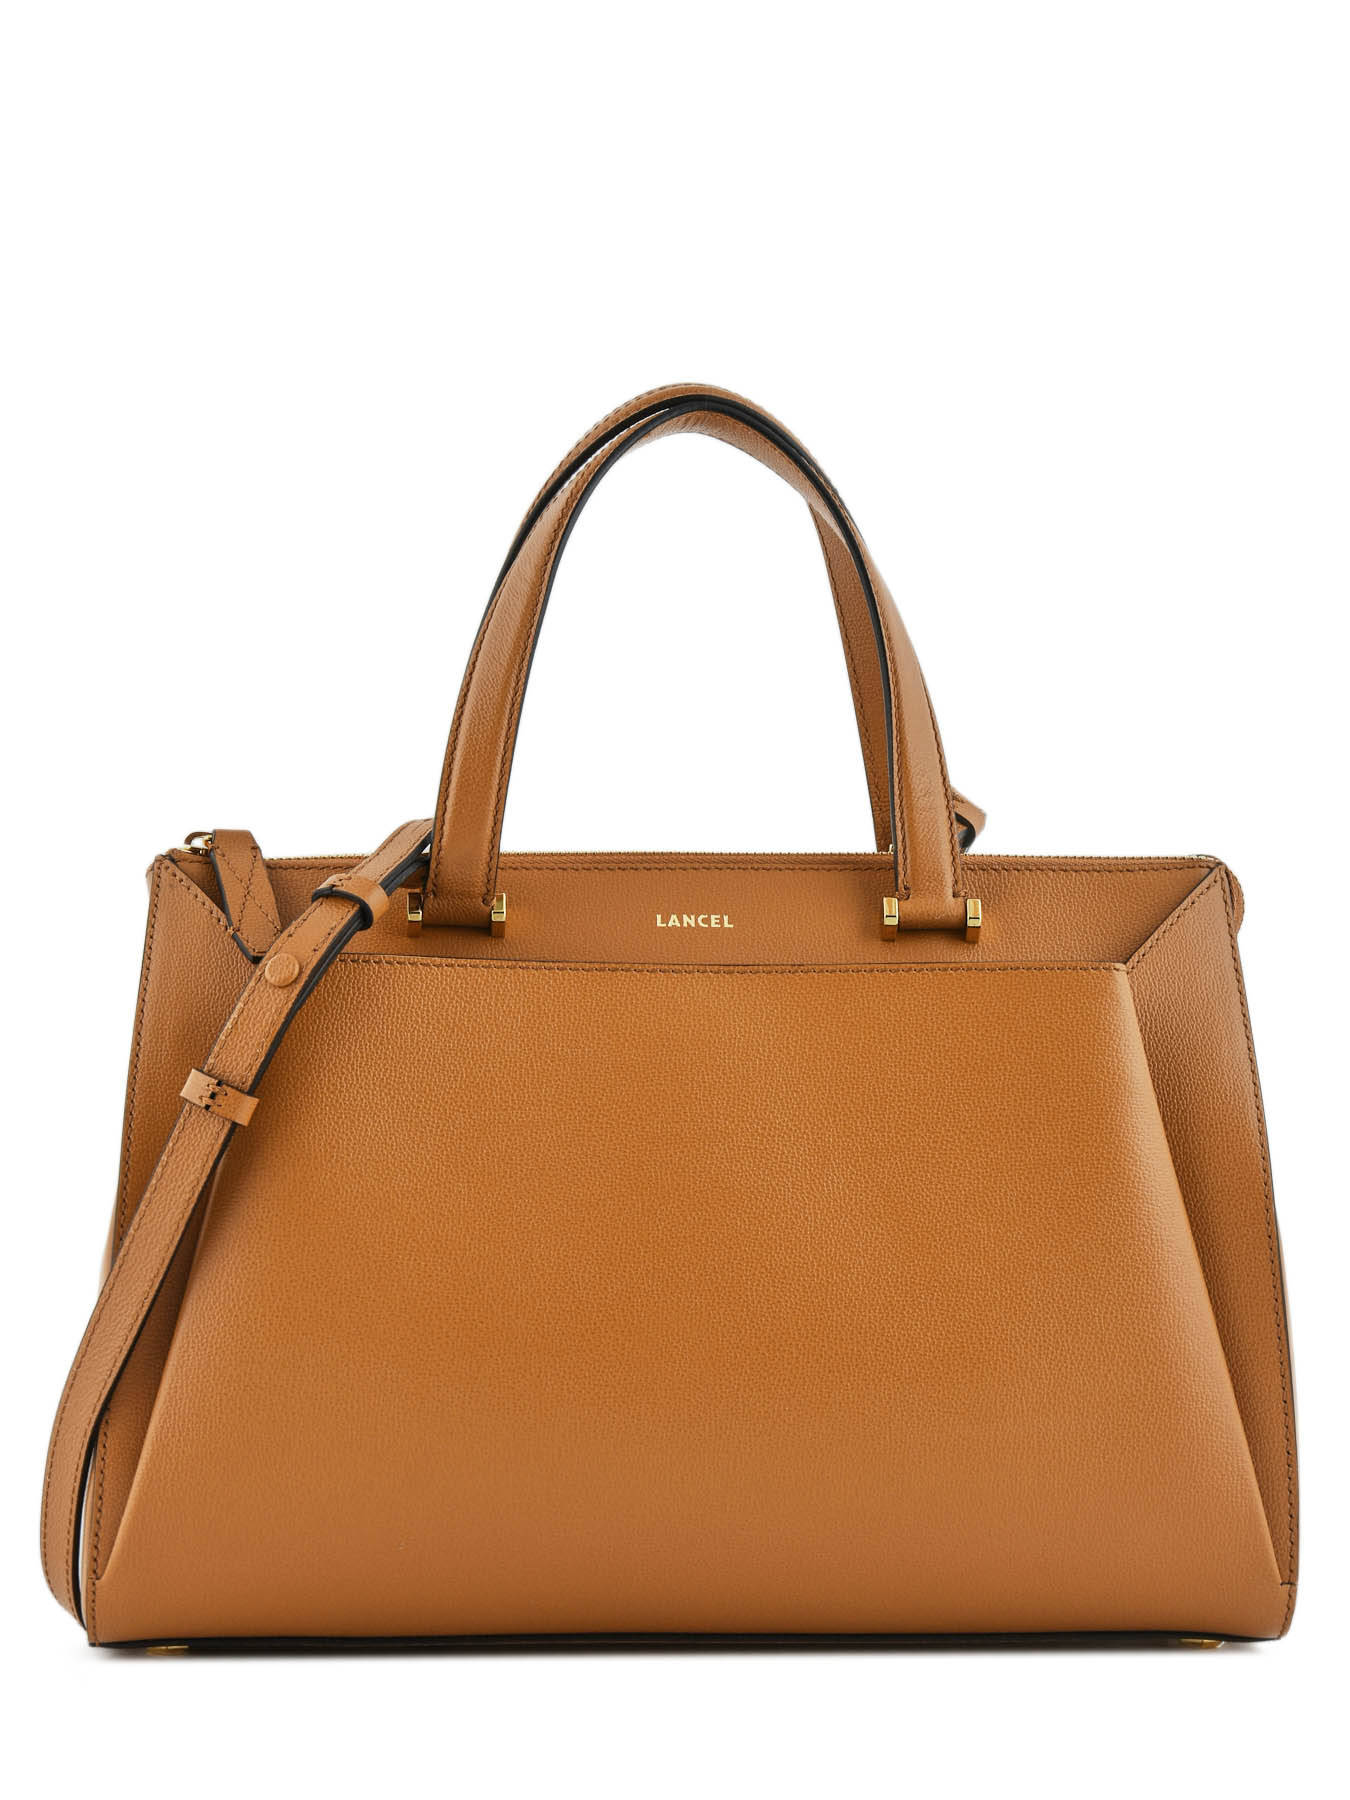 6038a73162 Tote Bag Lison Leather Lancel Brown lison A07893 ...